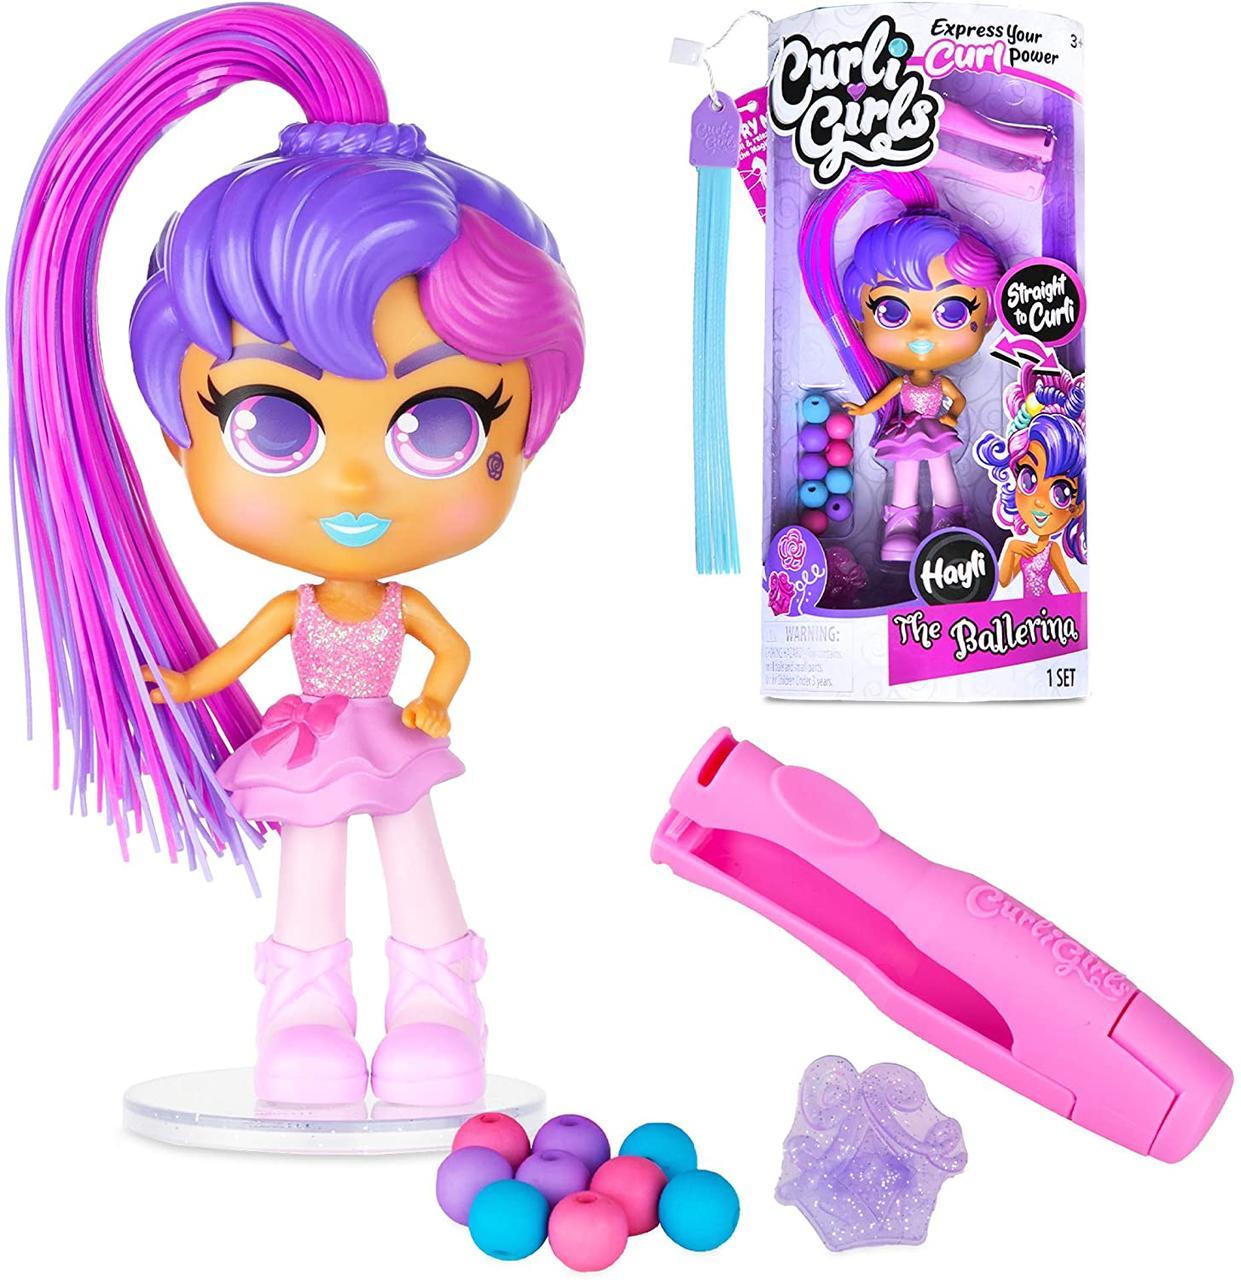 Кукла Curligirls - Балерина Хэйли Silverlit Toys CurliGirls Hayli Ballerina - Hairstyling Doll